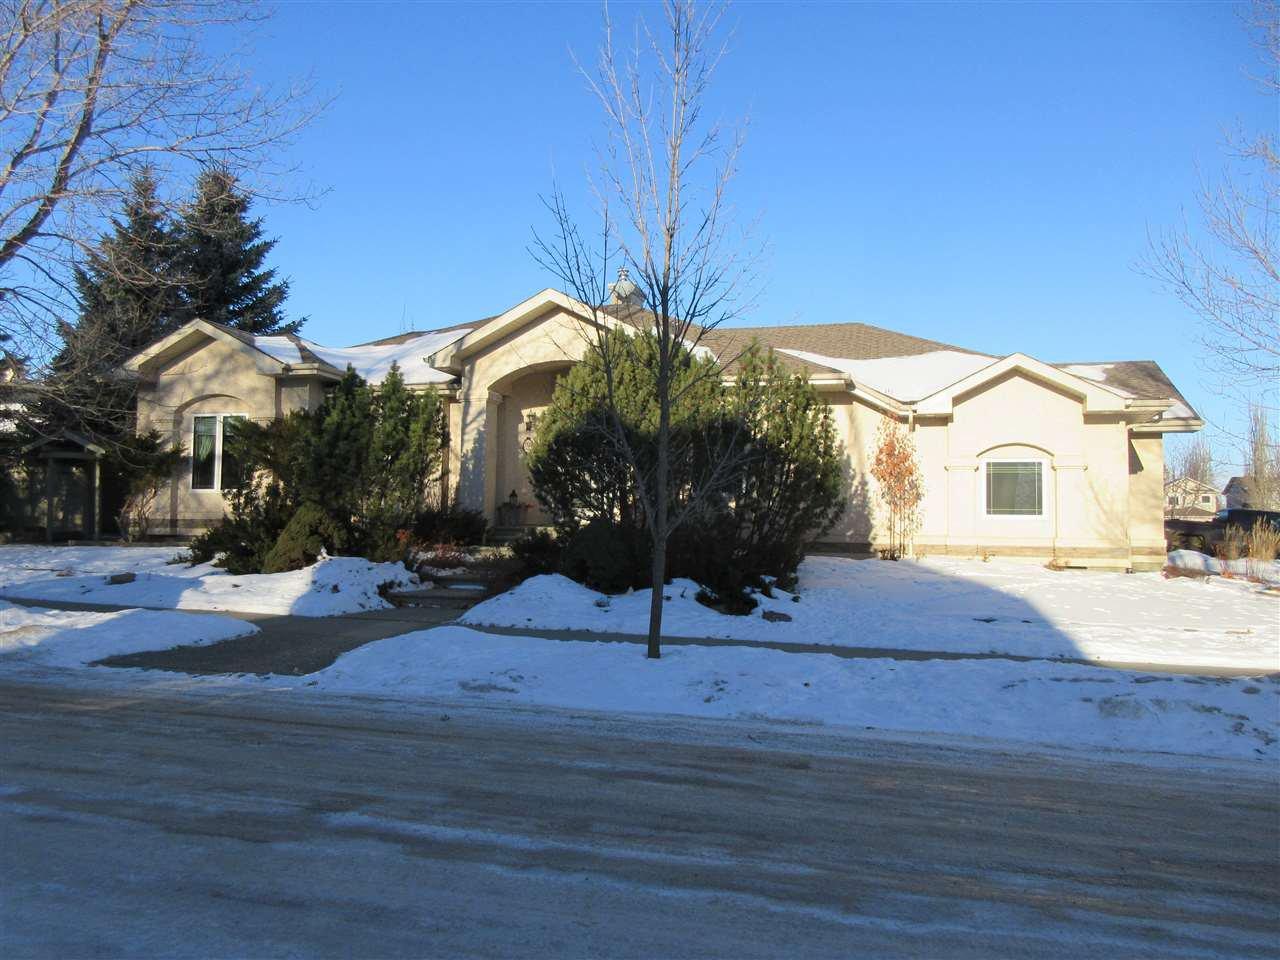 Main Photo: 26 EASTCOTT Drive: St. Albert House for sale : MLS®# E4223050